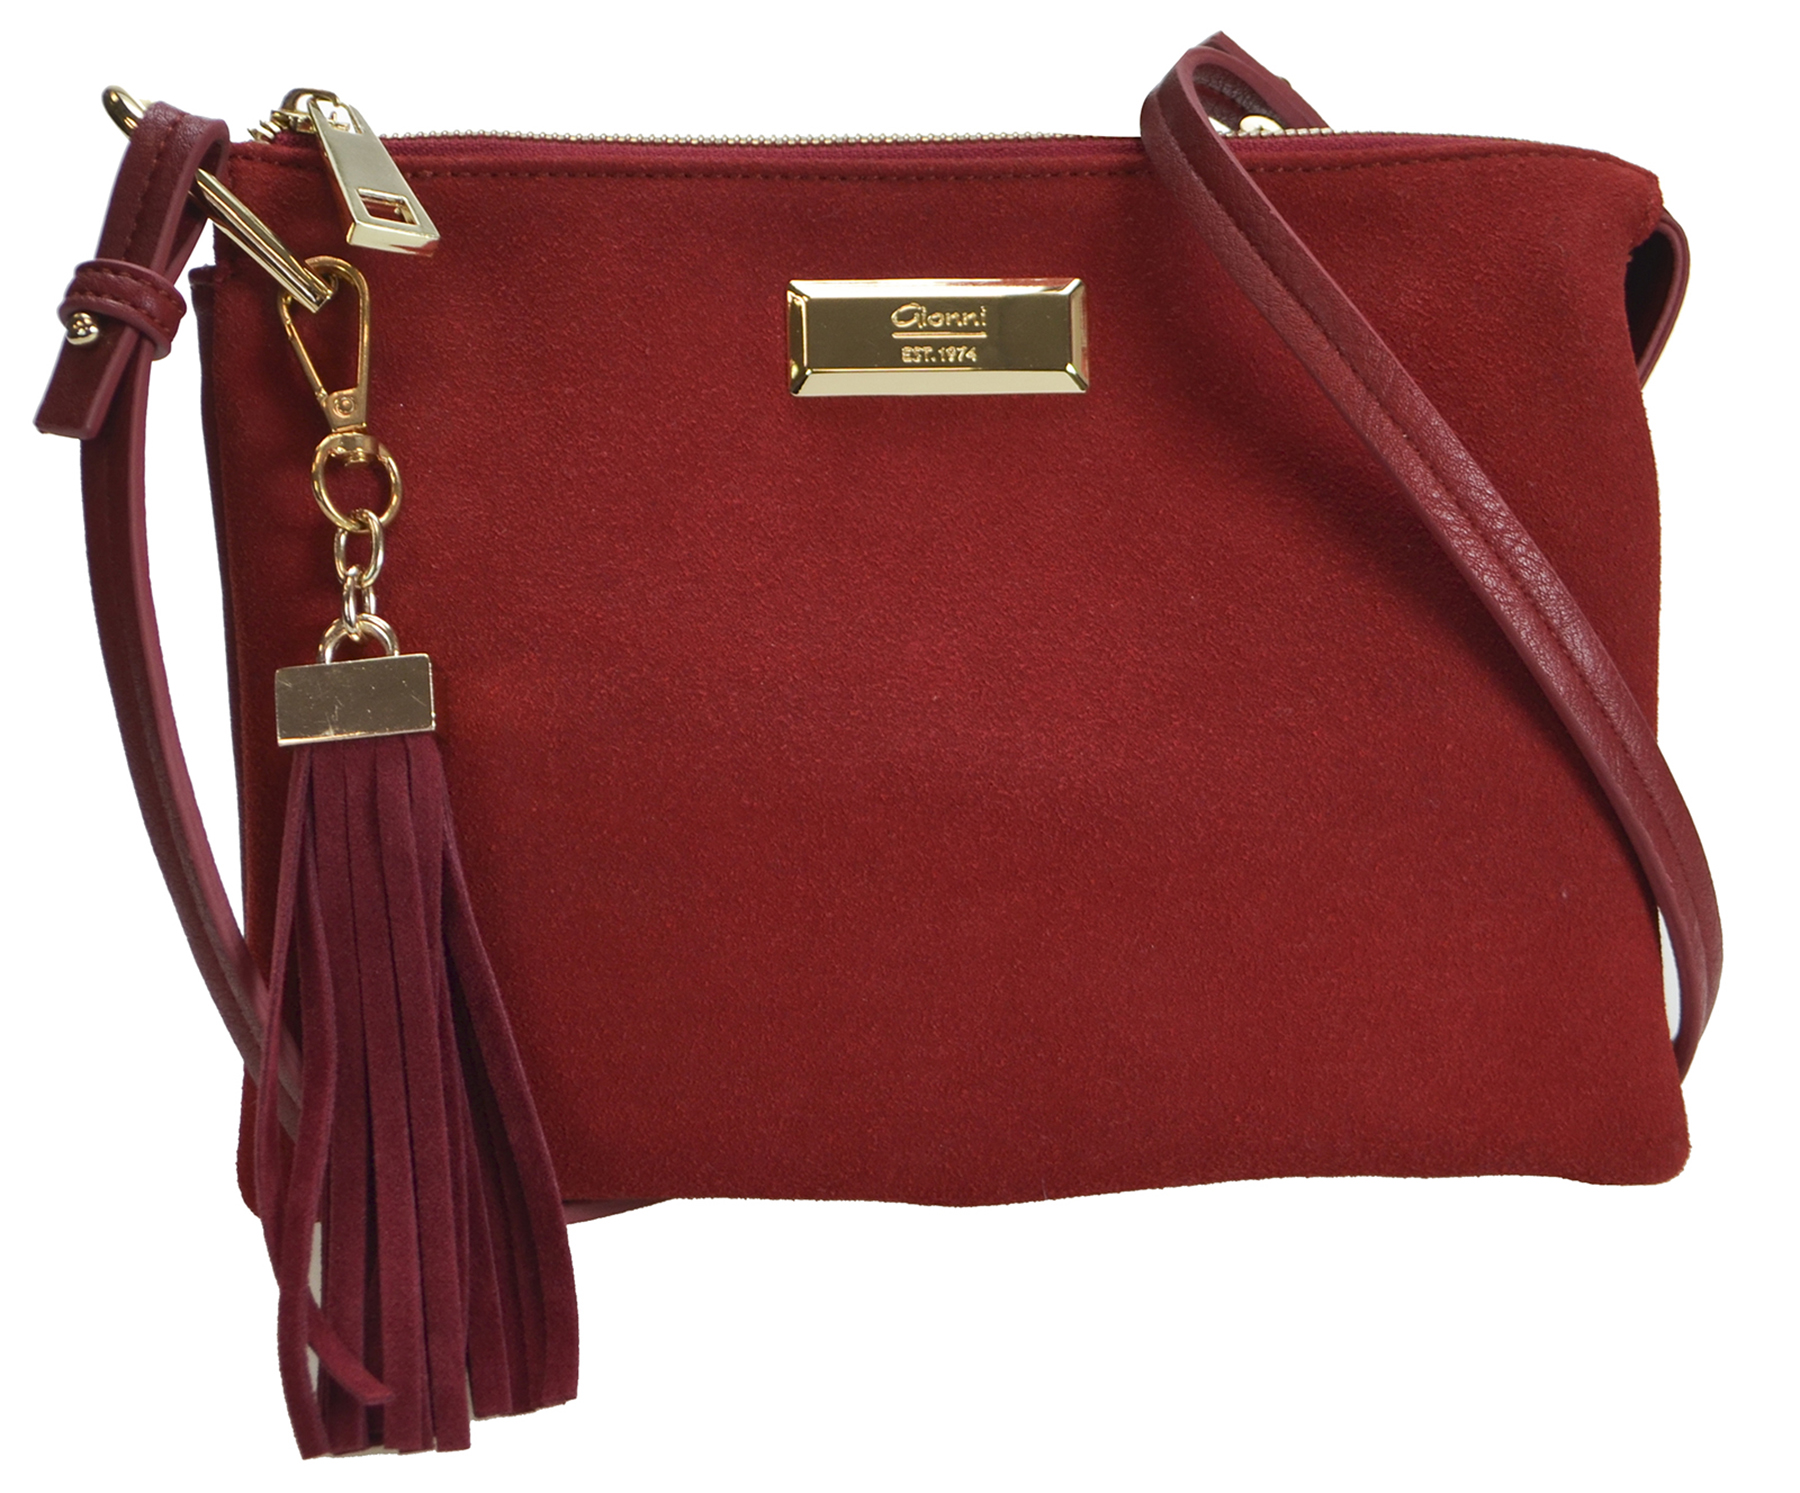 Red top zip double gusset with tassel shoulder bag. €39 £36. Available at Kilkenny, Menary's, Shaws, Debenhams and Pamela Scott..JPG